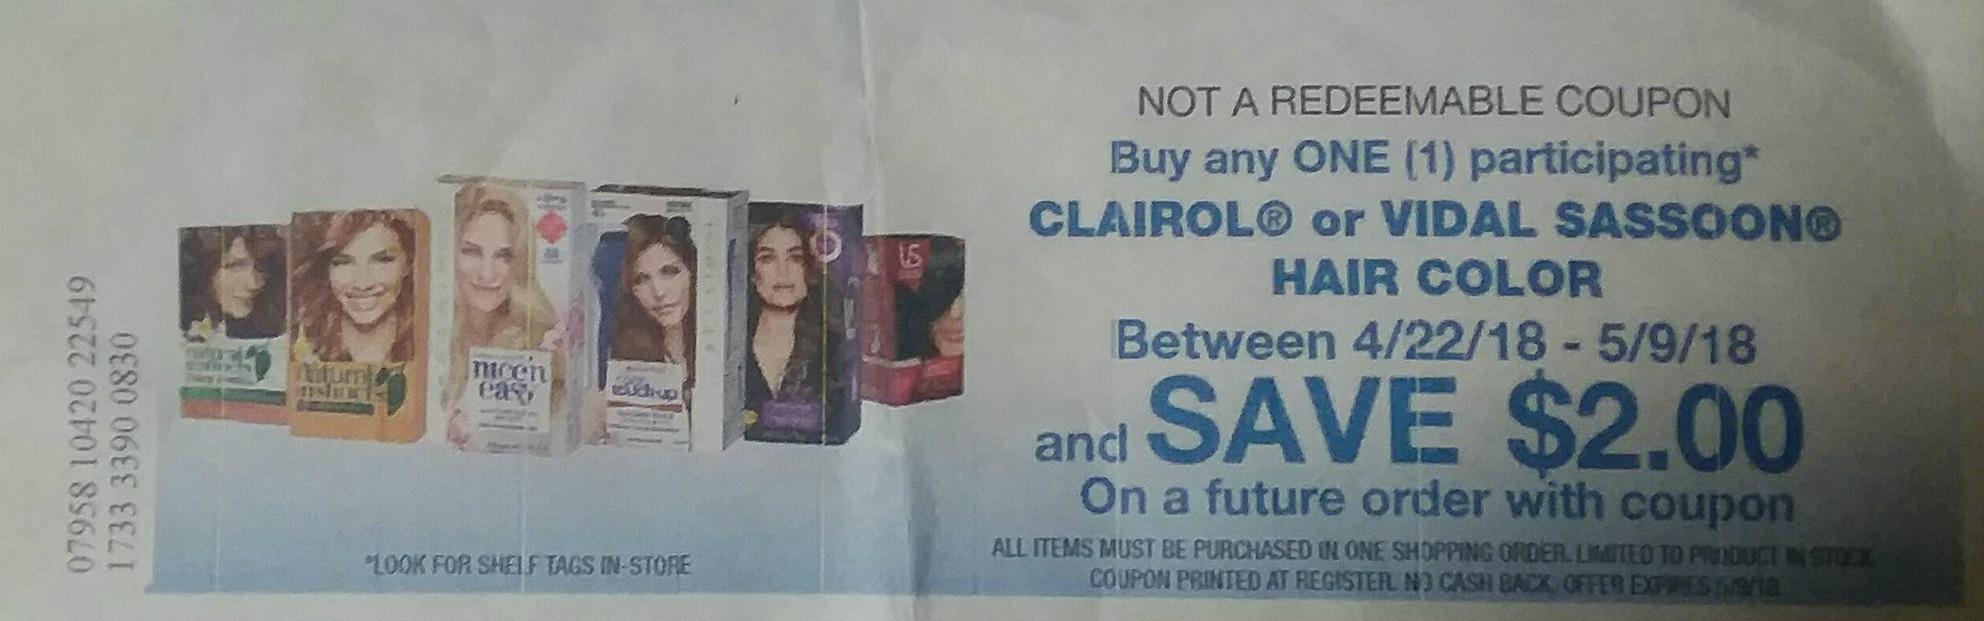 New Clairol Coupon Catalina Free Hair Color At Kroger Kroger